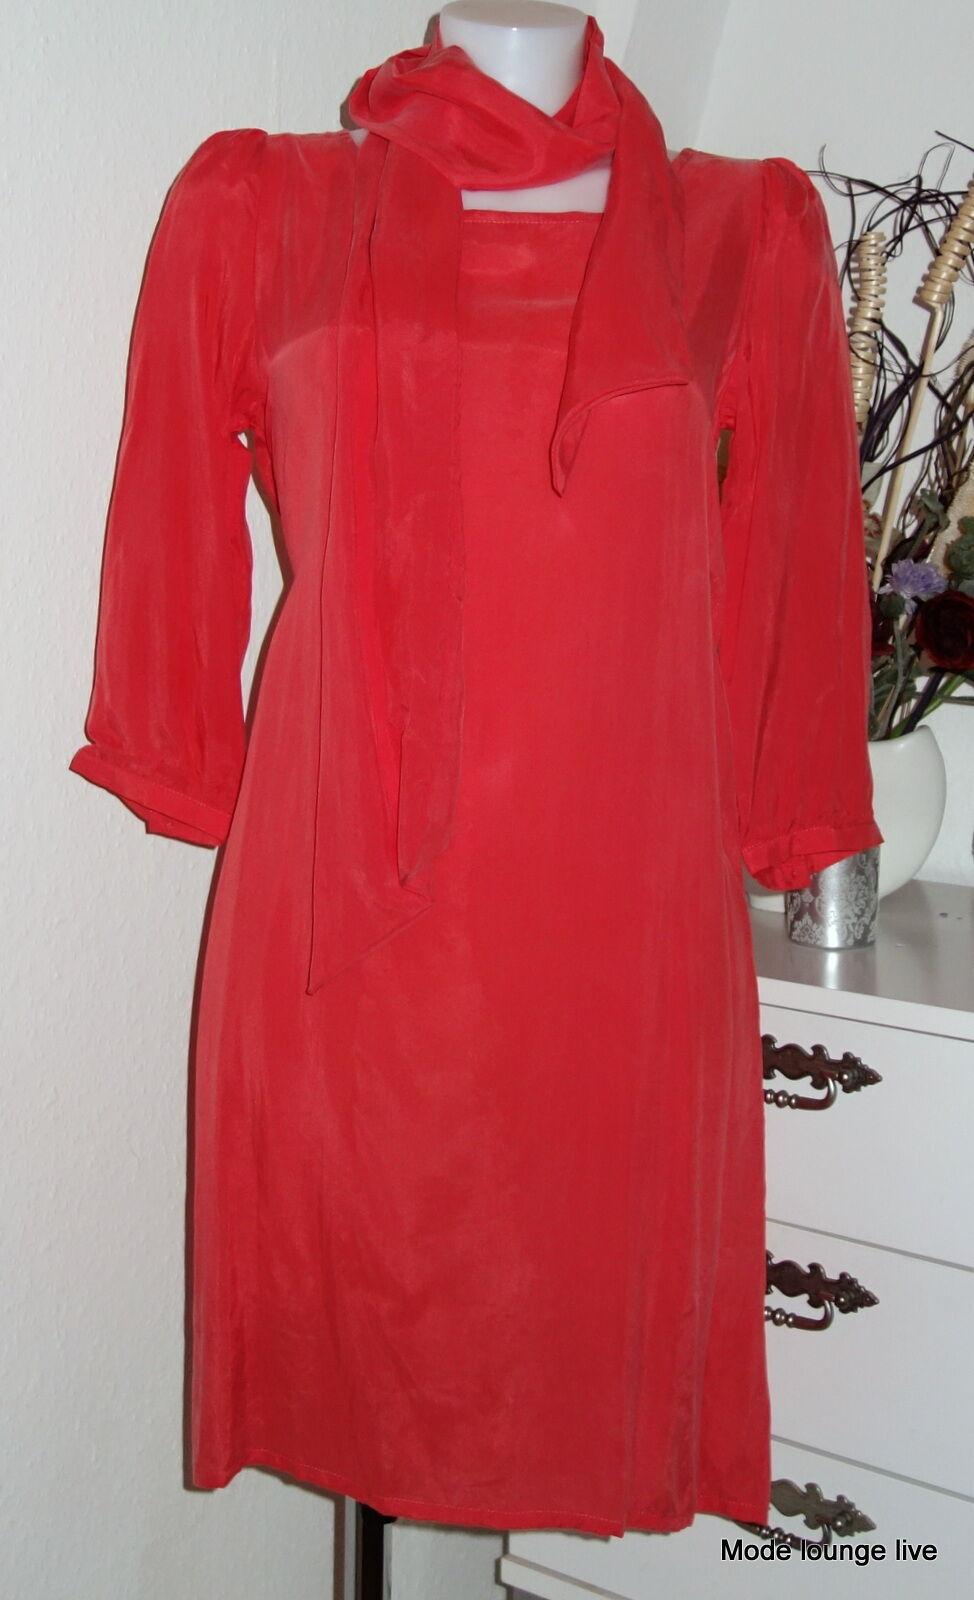 Ester Elenora Dress Lena New Long Coral Hummer Silk Cupro Red M L XL